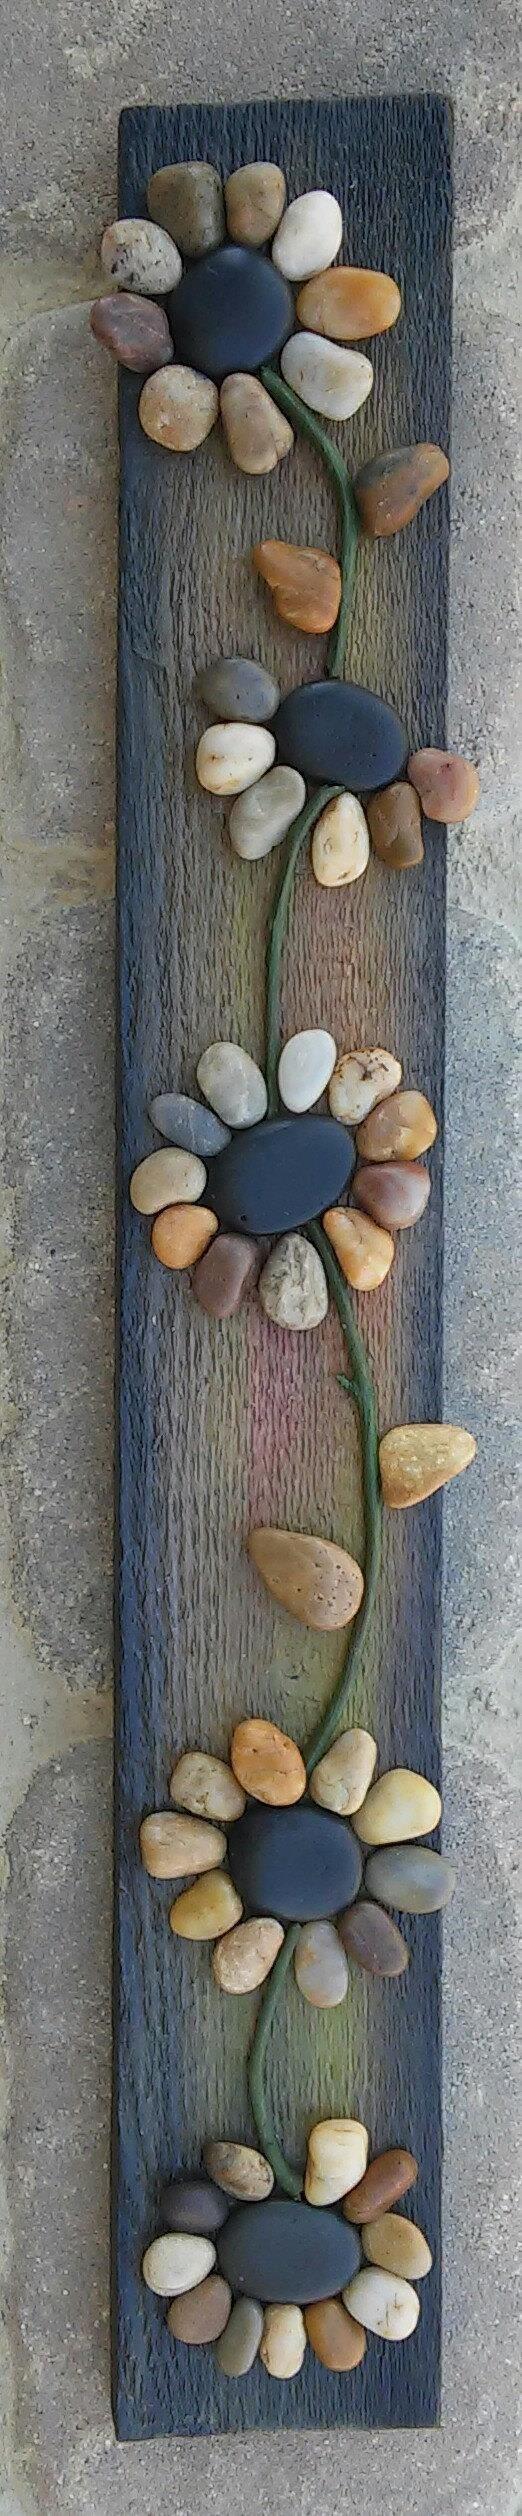 Best 25+ Outdoor Wall Art Ideas On Pinterest | Outdoor Art, Garden Pertaining To Italian Ceramic Outdoor Wall Art (Image 9 of 20)